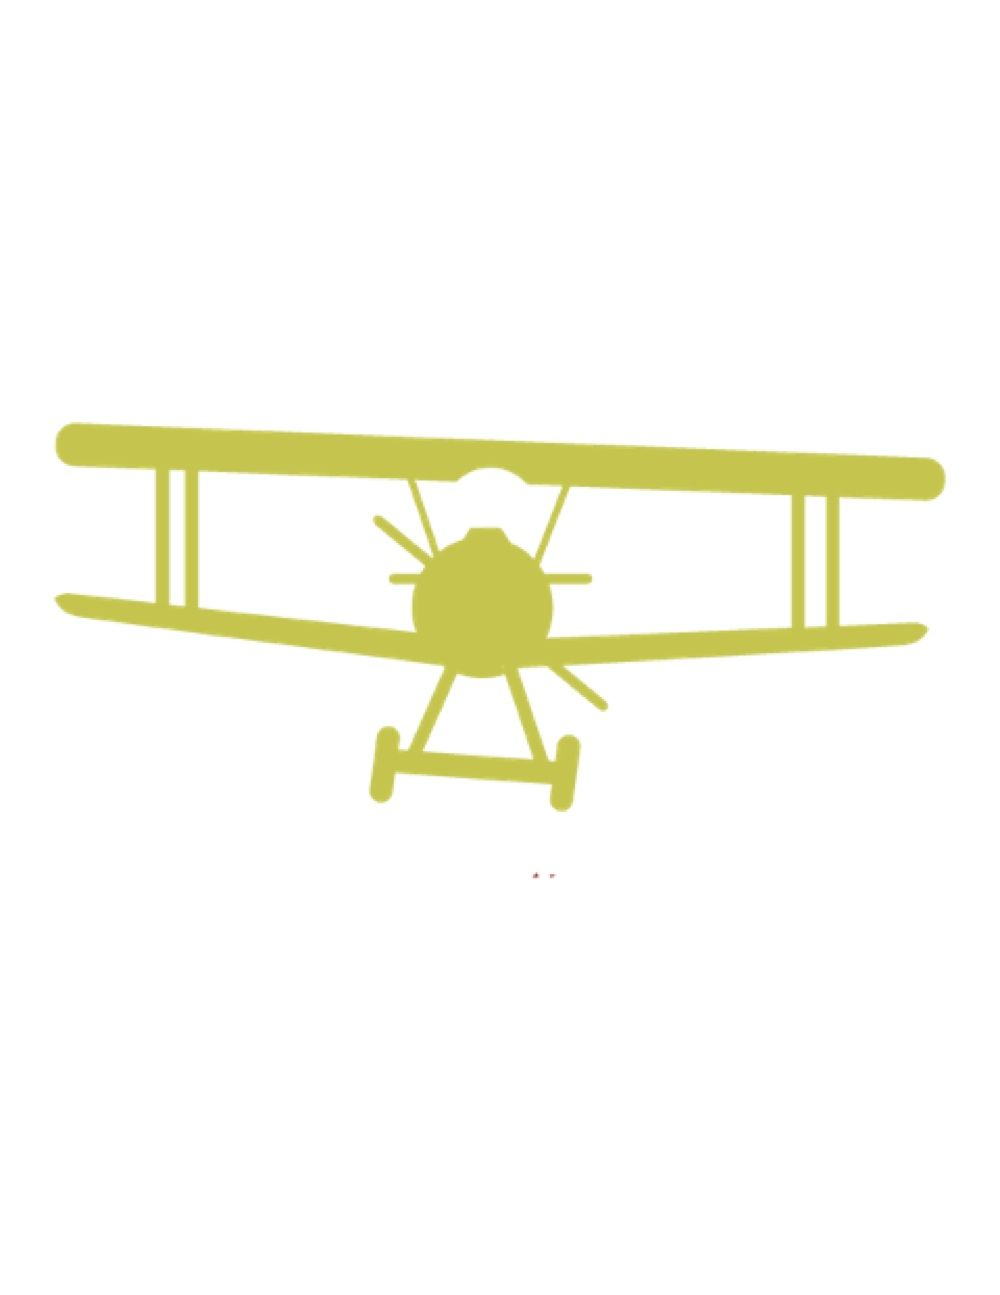 36098e2e1acab4d983c72c8434a9fefd Vintage Aviation Lettering Template on aviation pencils, aviation logos, aviation architecture, aviation advertising, aviation stickers, aviation awards, aviation design, aviation uniforms, aviation books, aviation sketching, aviation clothing,